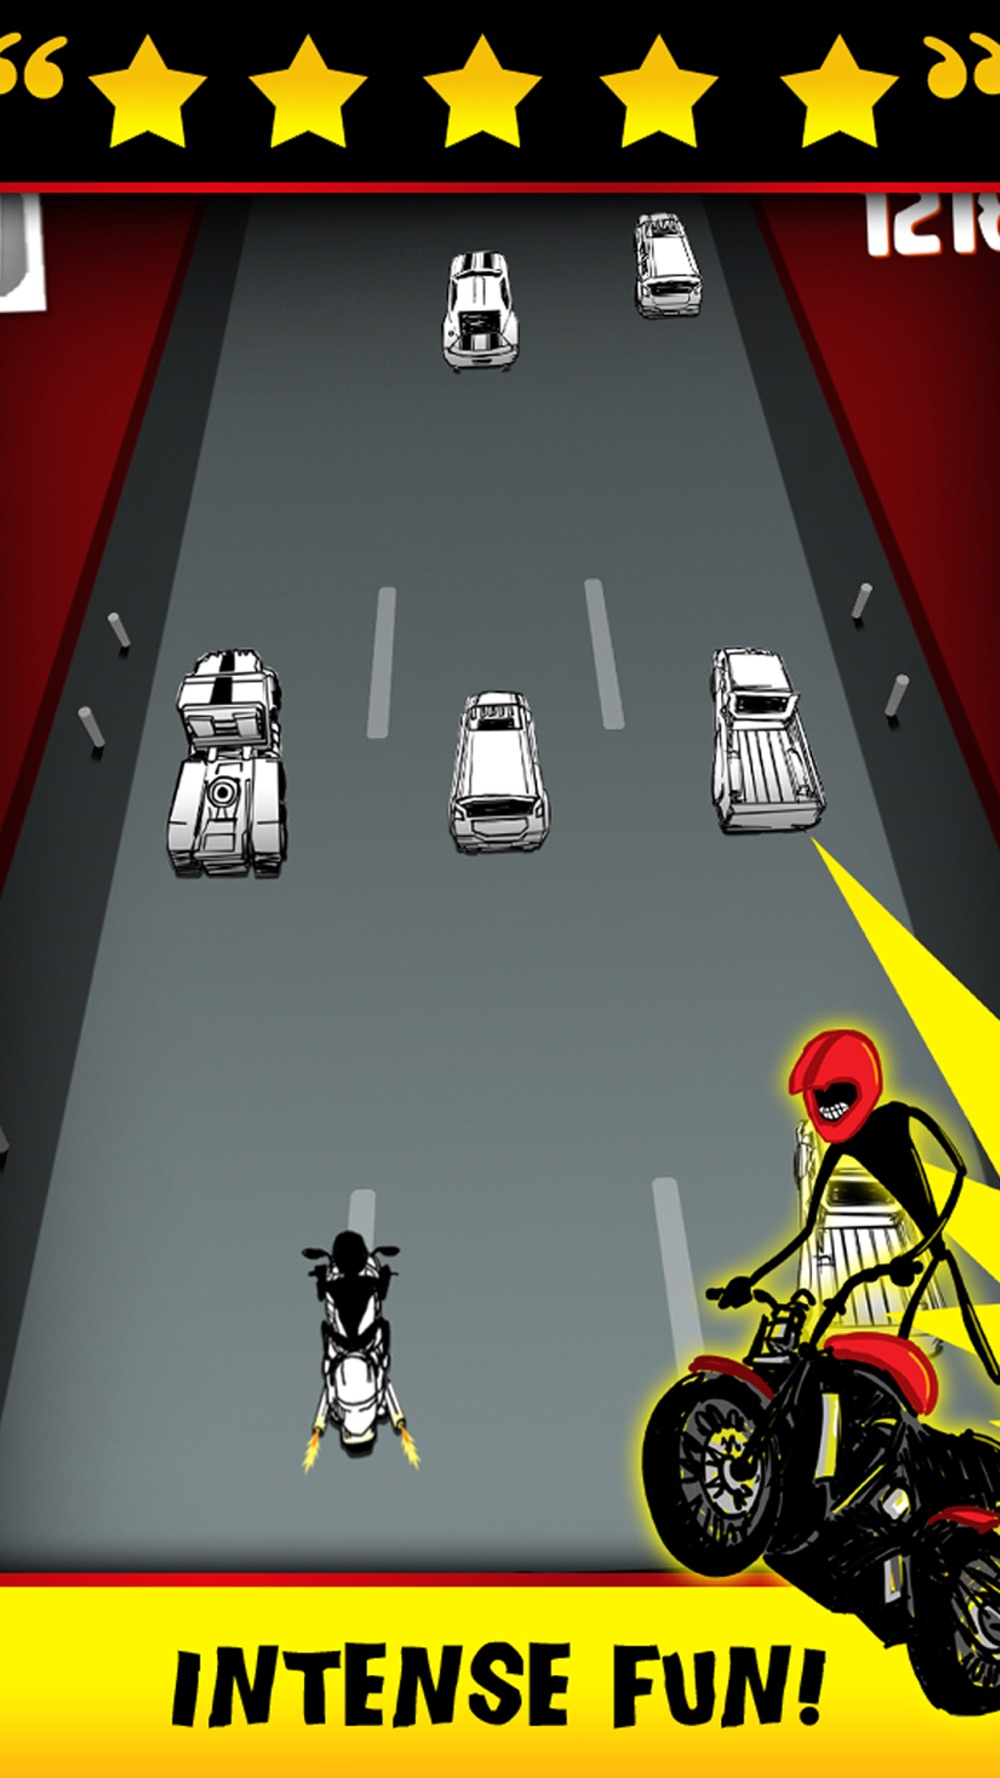 Stickman Street Bike Motorcycle Highway Race - FREE Multiplayer Racing Game hack tool